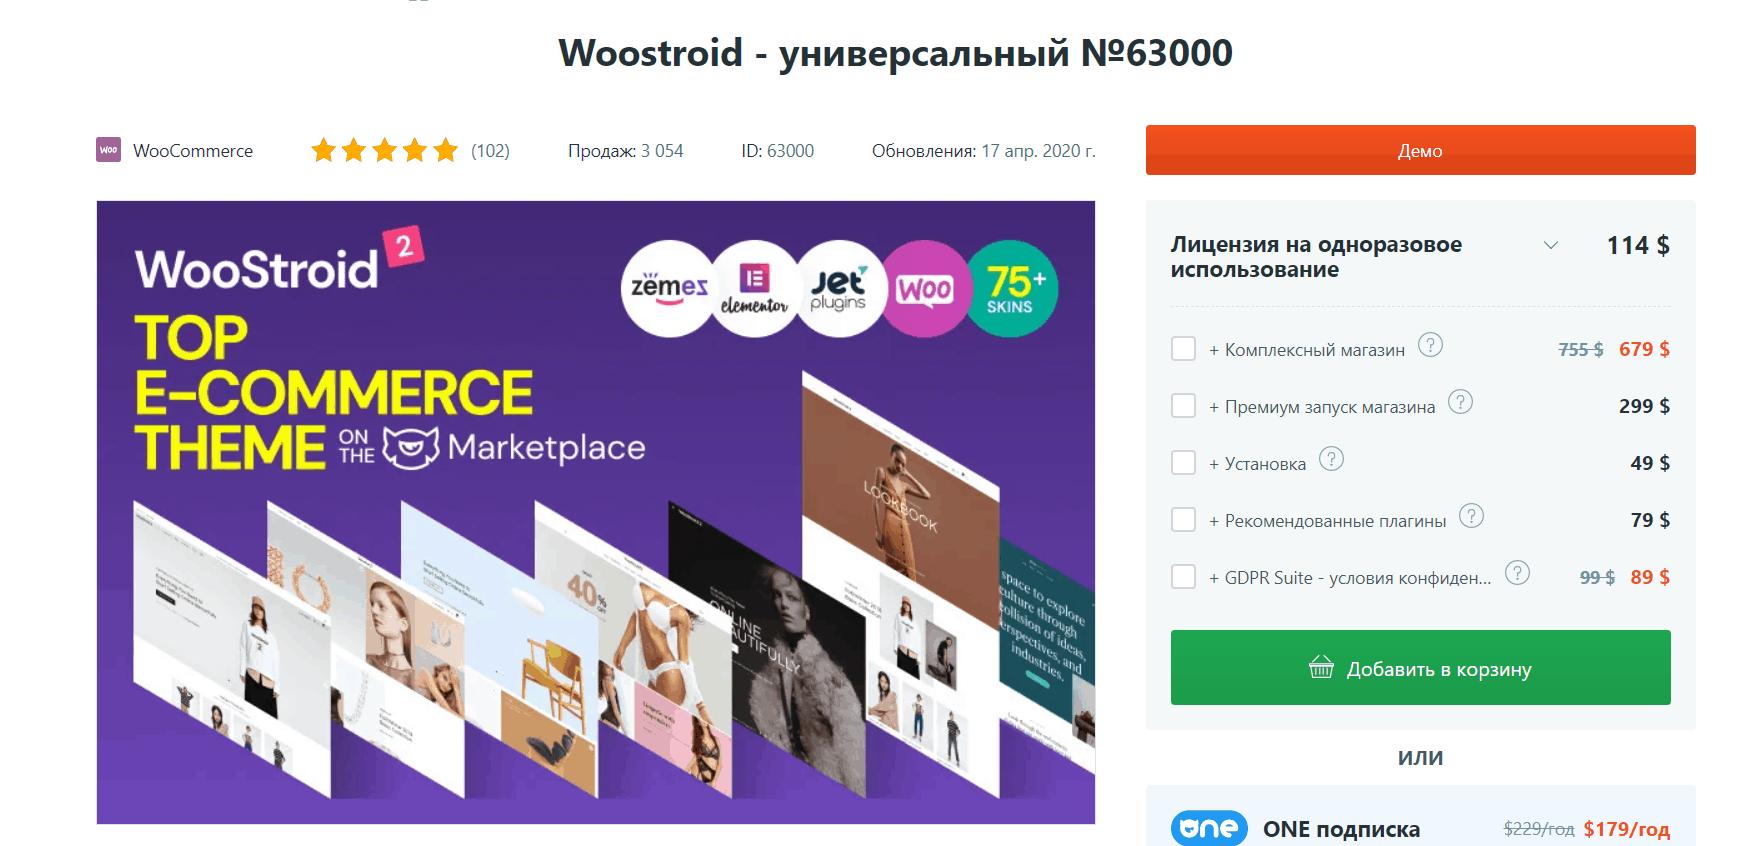 Тема для интернет-магазина WooStroid